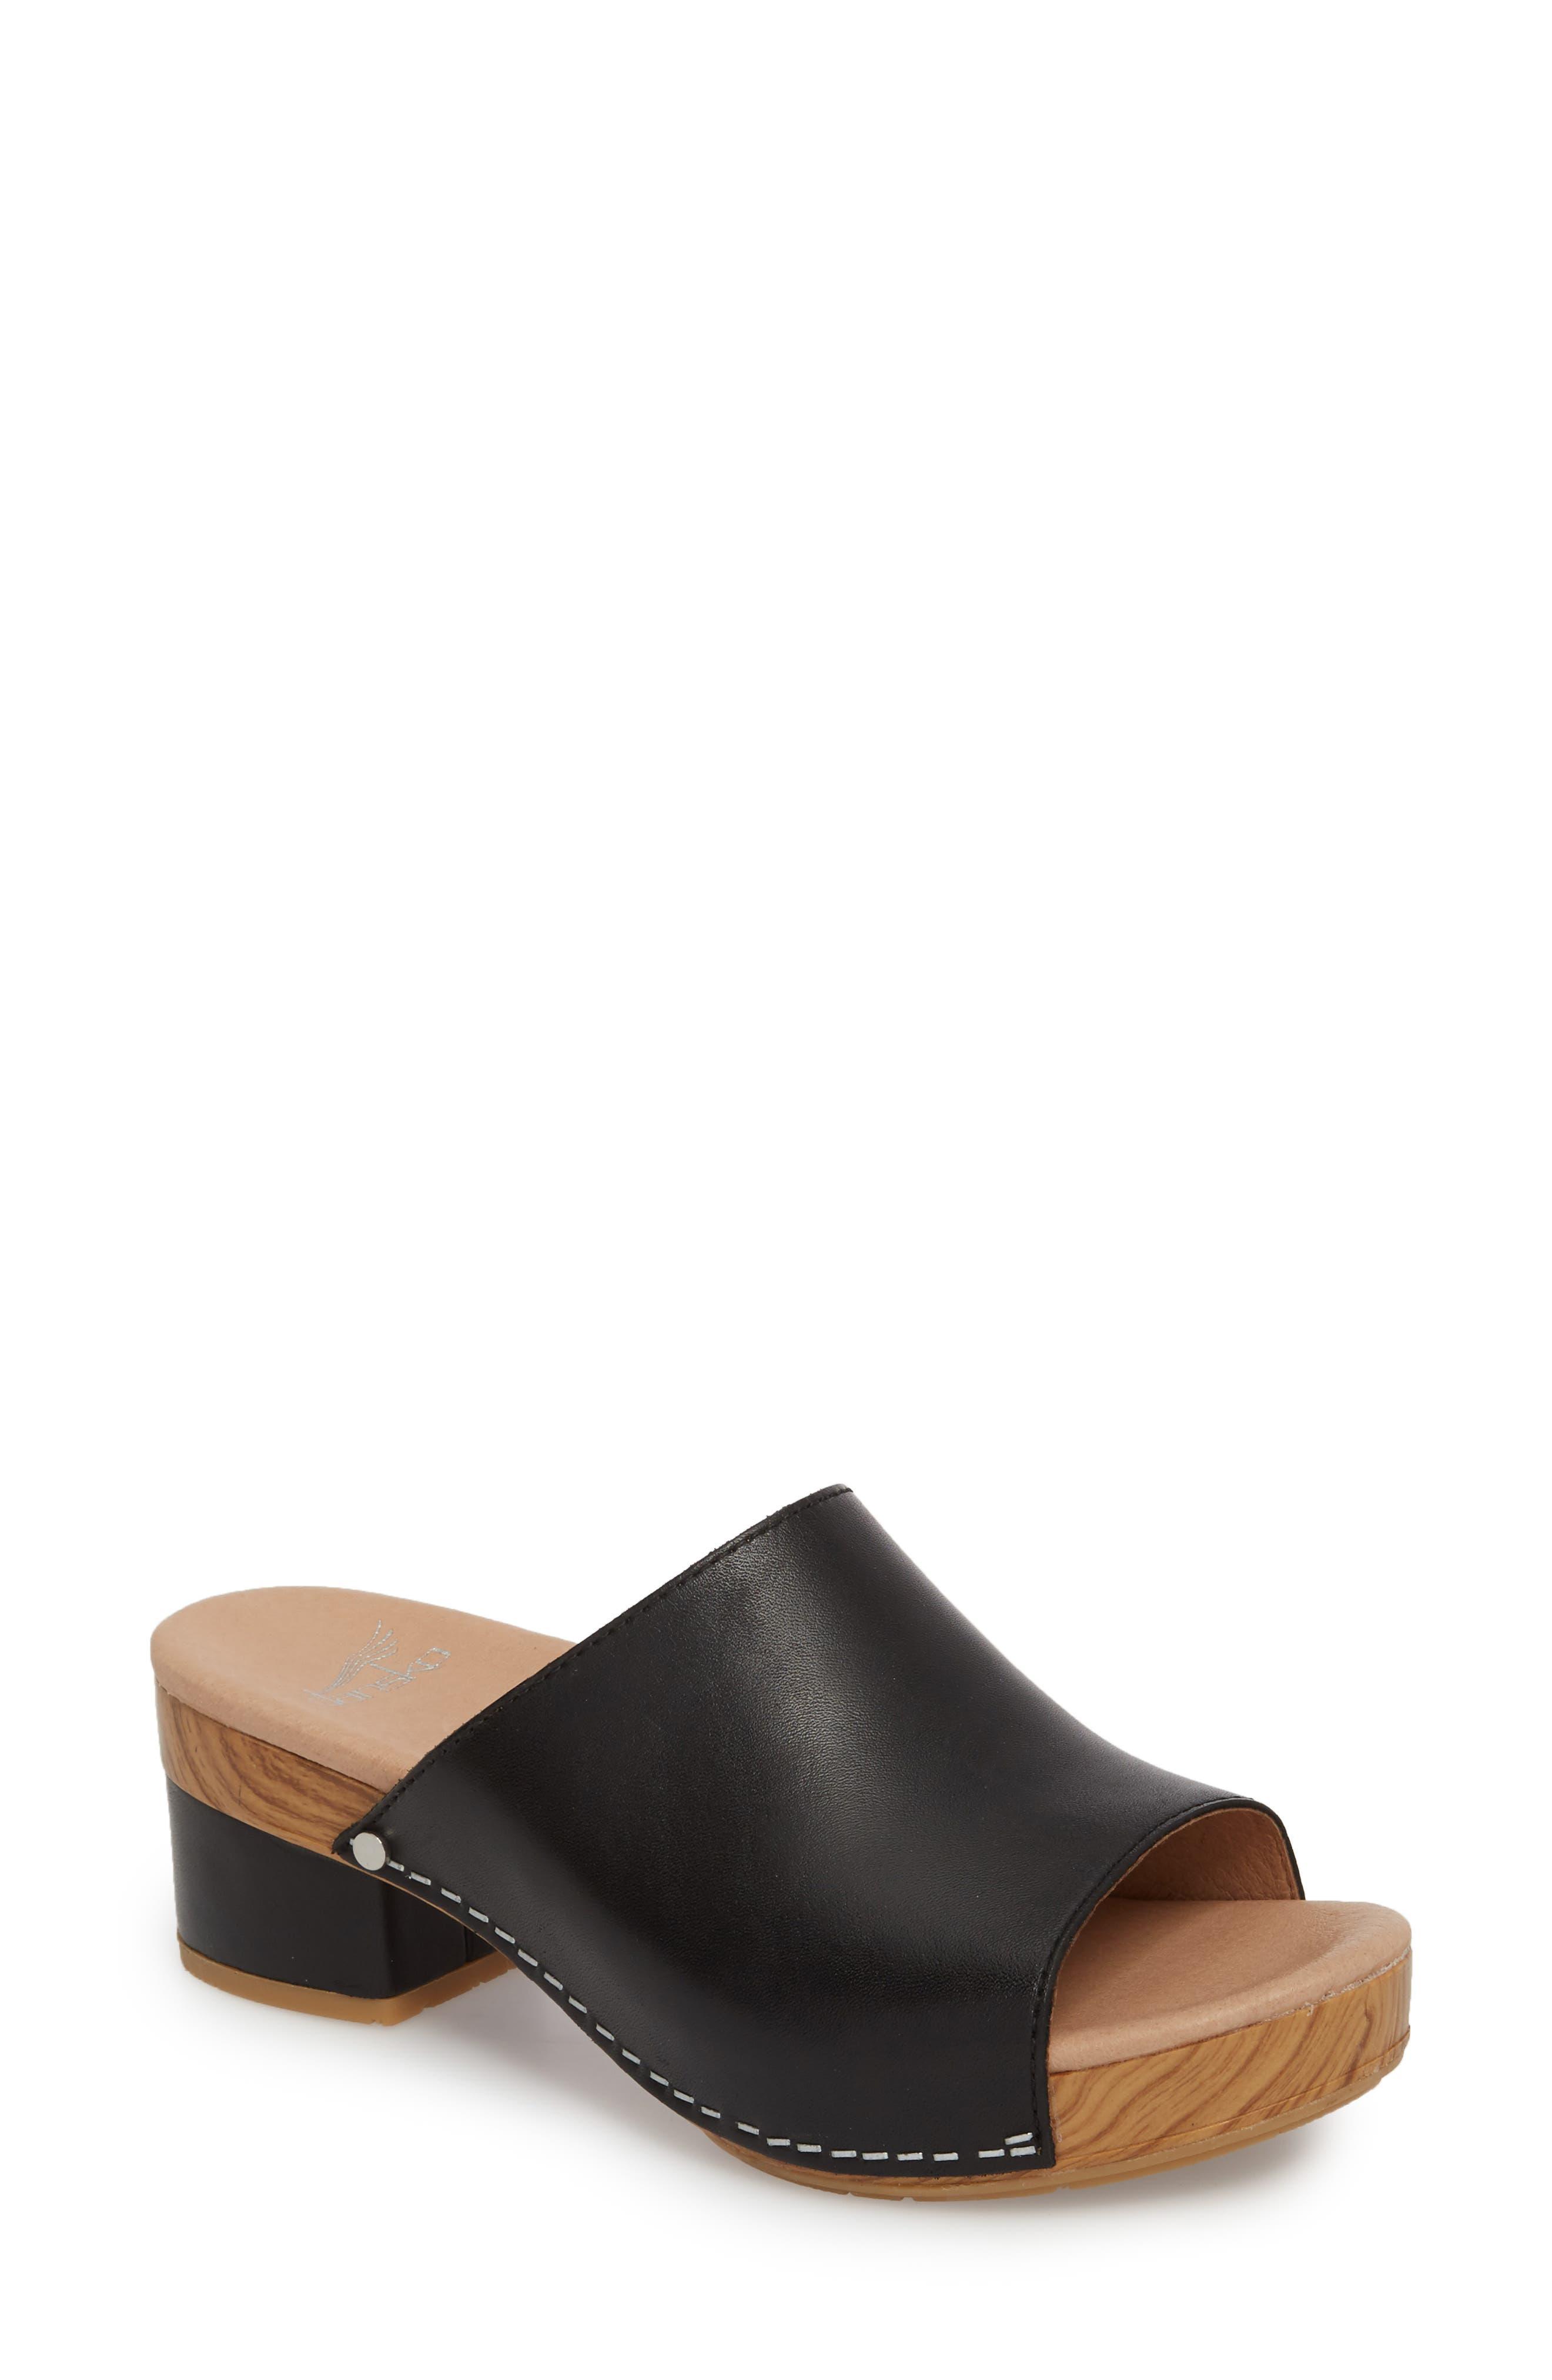 Maci Mule Sandal,                             Main thumbnail 1, color,                             BLACK LEATHER